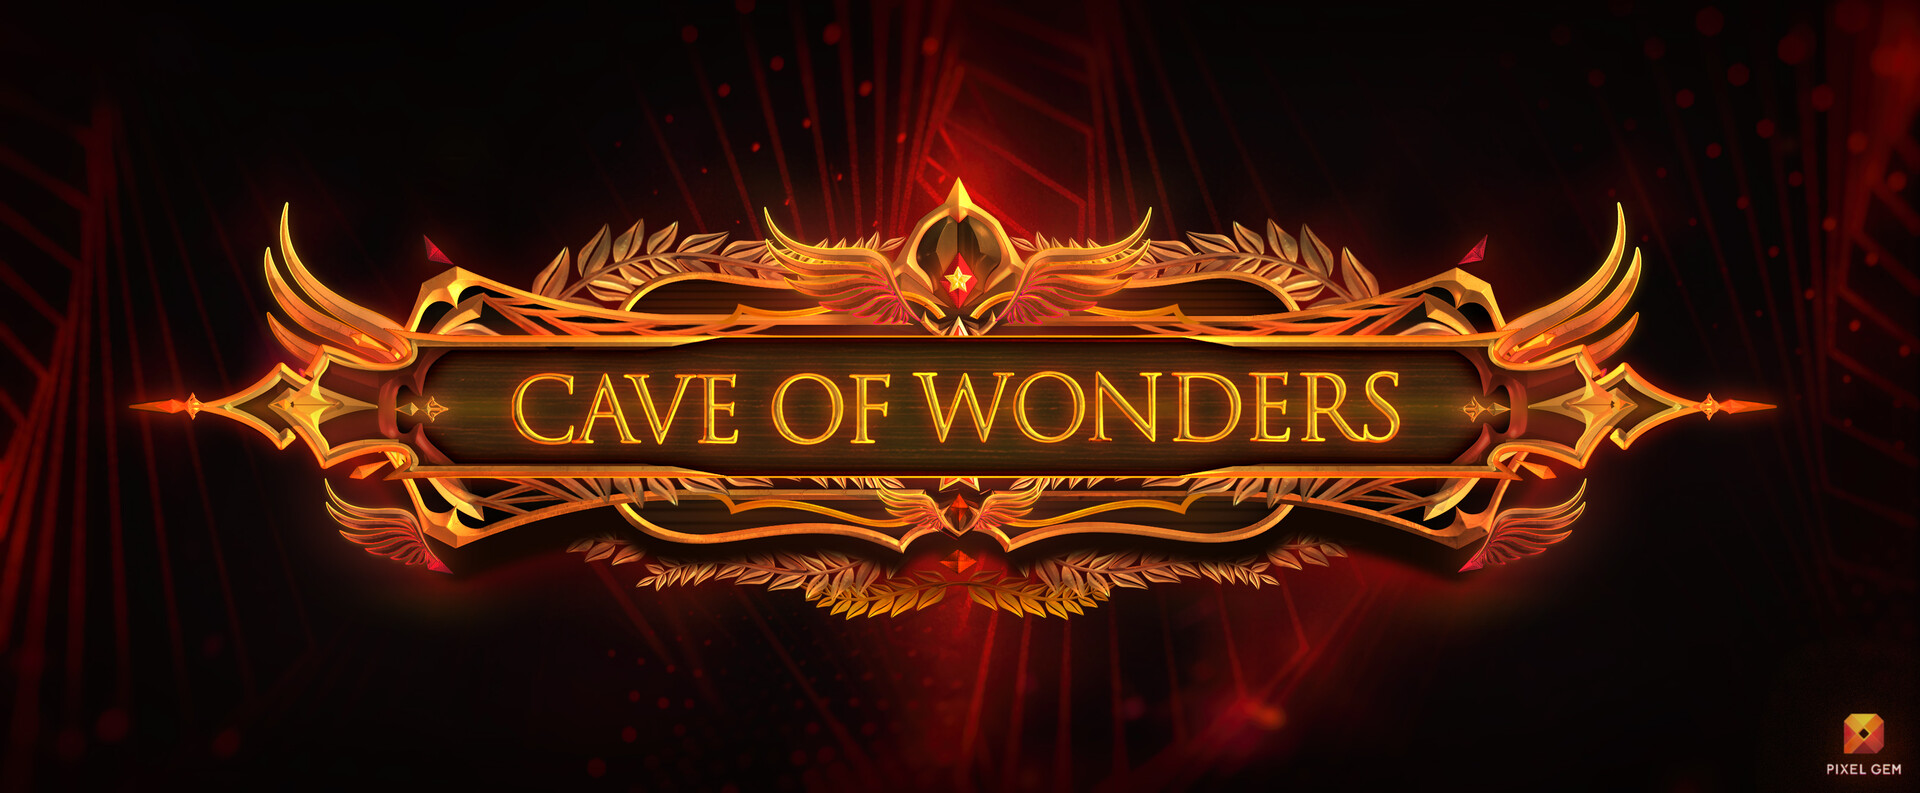 Long ken caveofwonders title 03